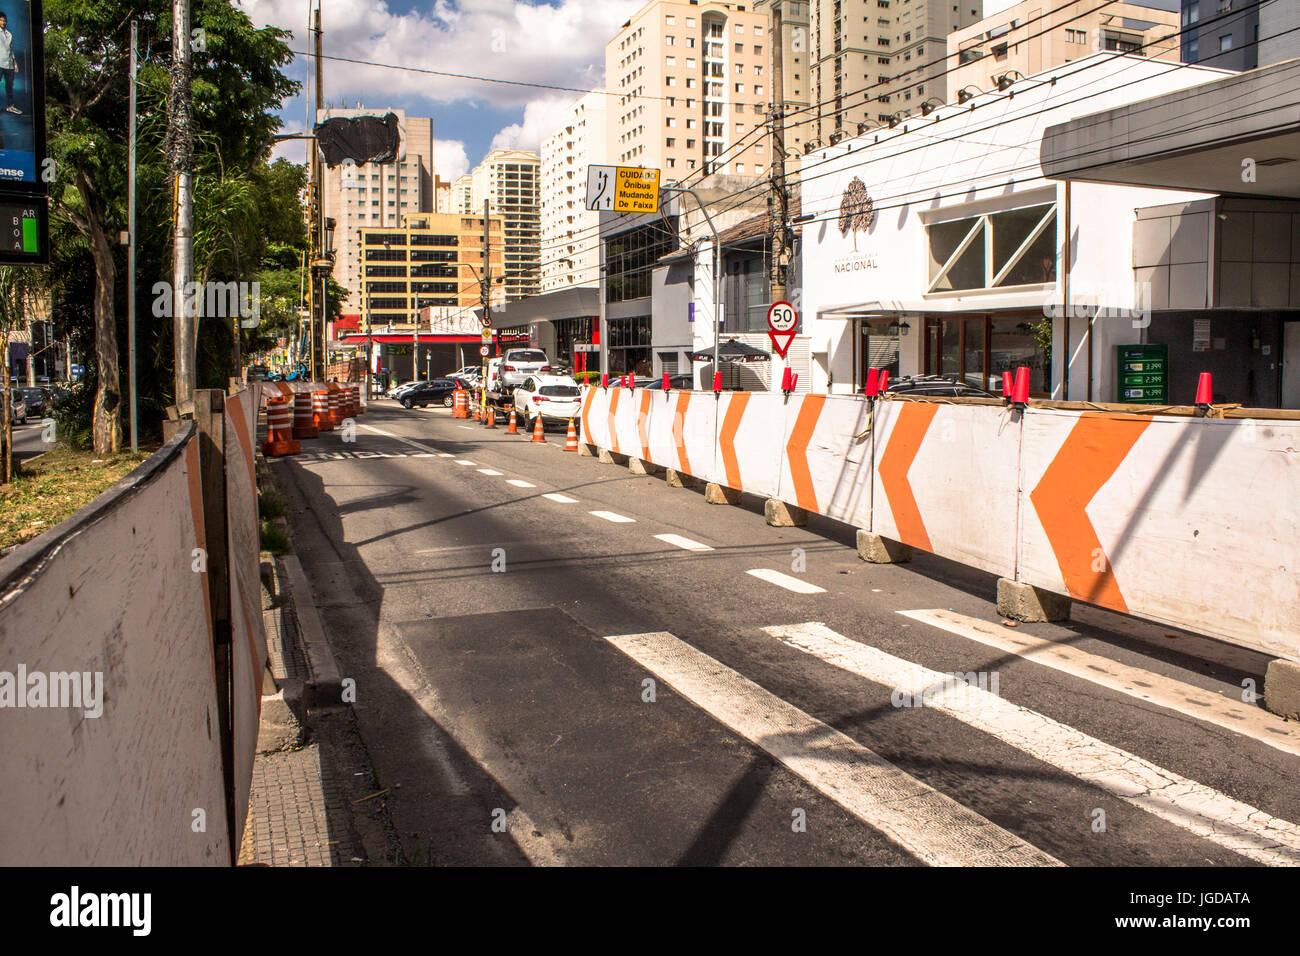 Sidings, cones, bus lane, Ibirapuera Avenue, 11.12.2015, Capital, São Paulo, Brazil. - Stock Image